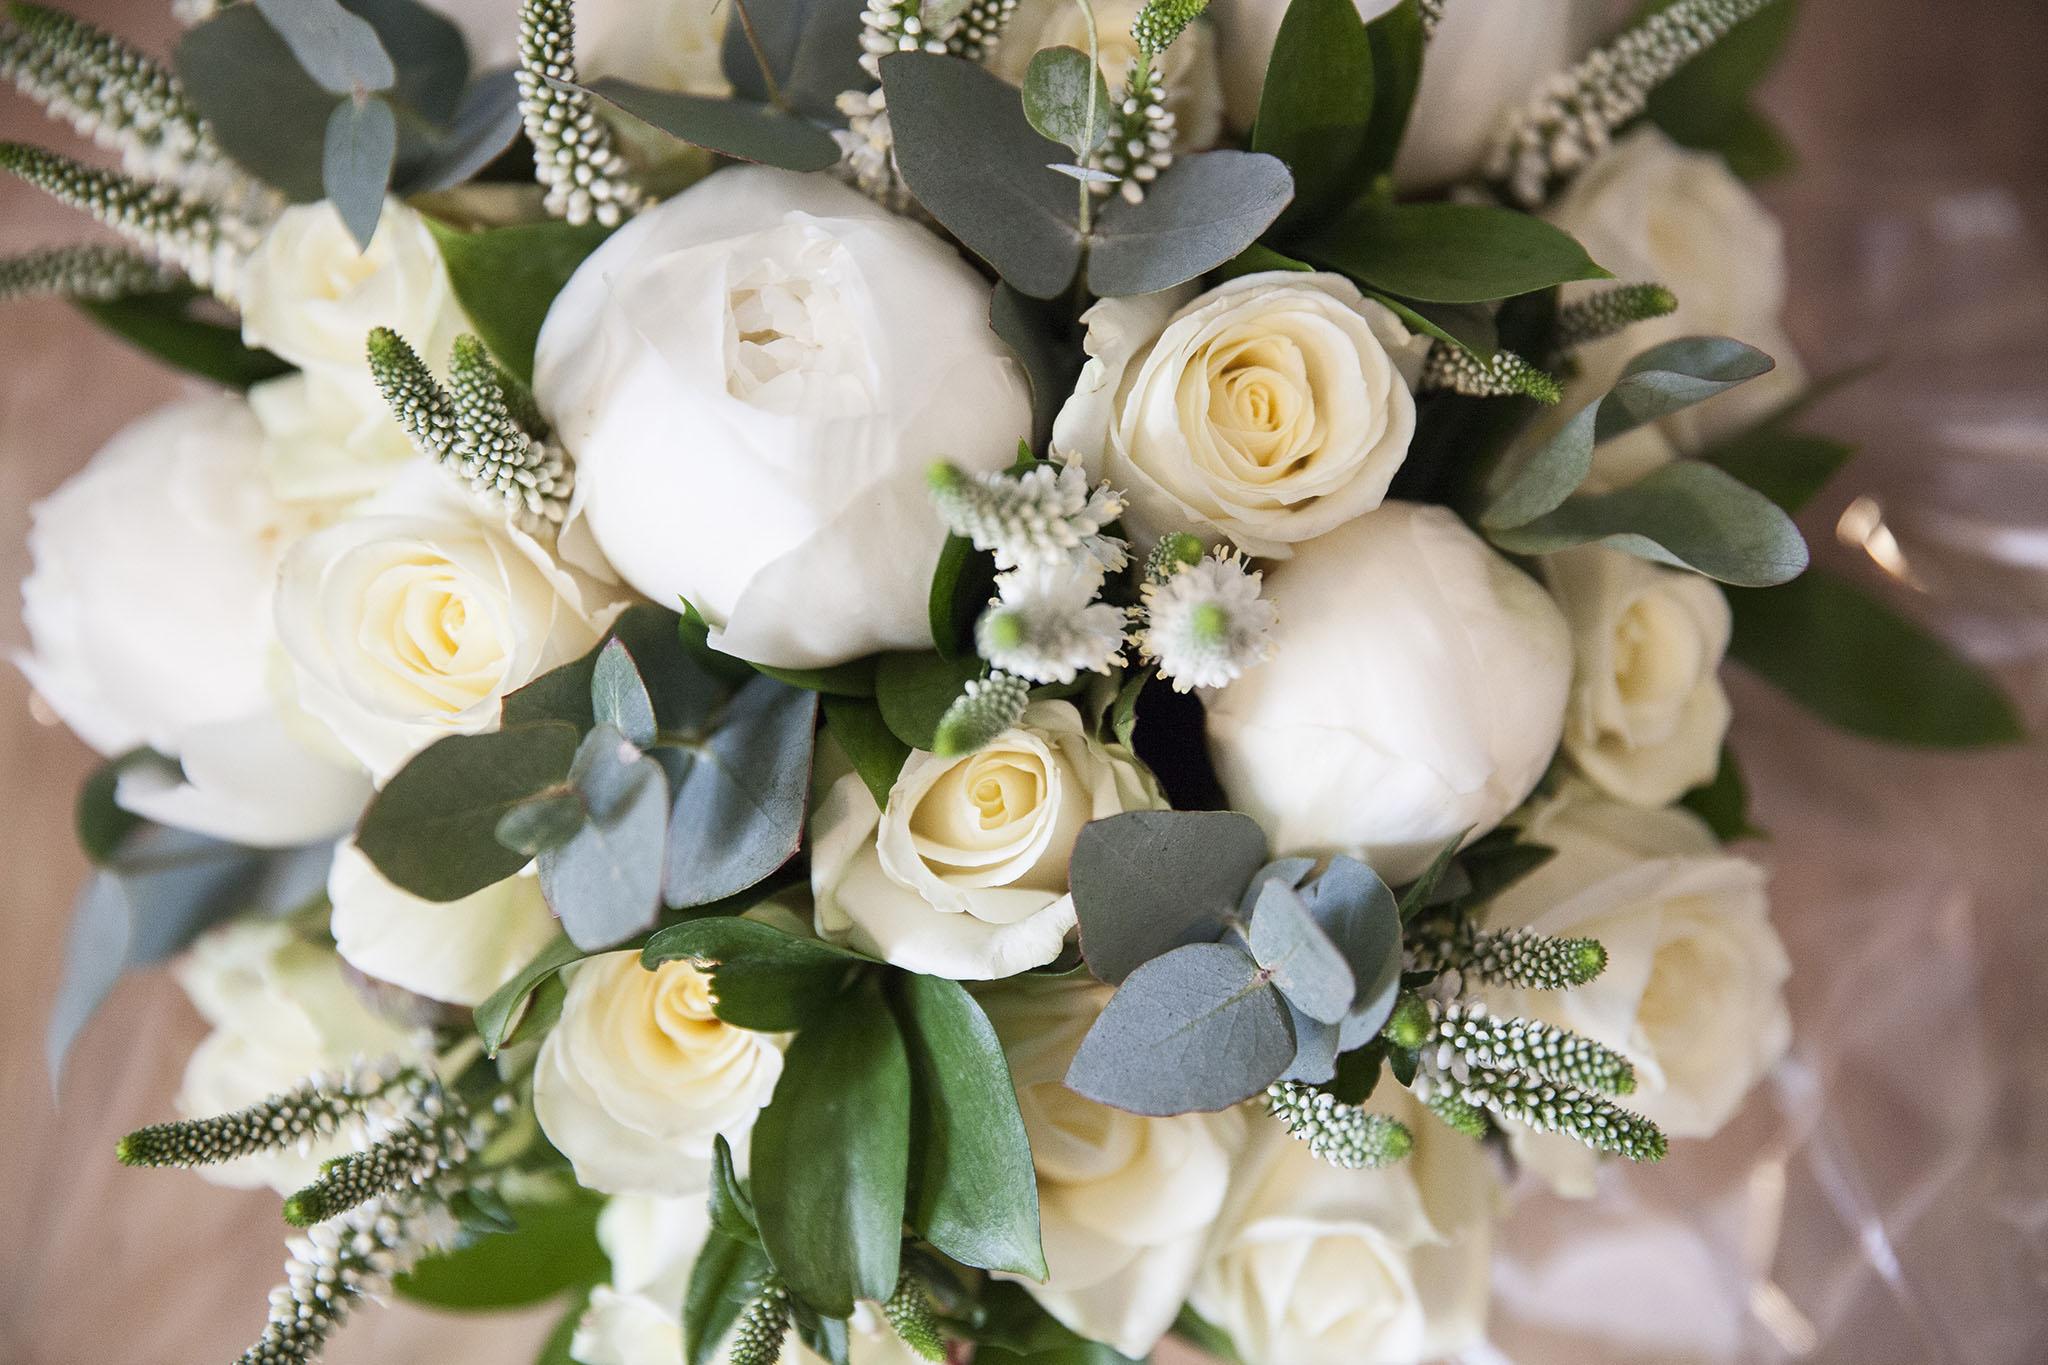 elizabethgphotography_kingslangley_hertfordshire_fineart_wedding_enfield_ricky_nicole_nahlis_09.jpg